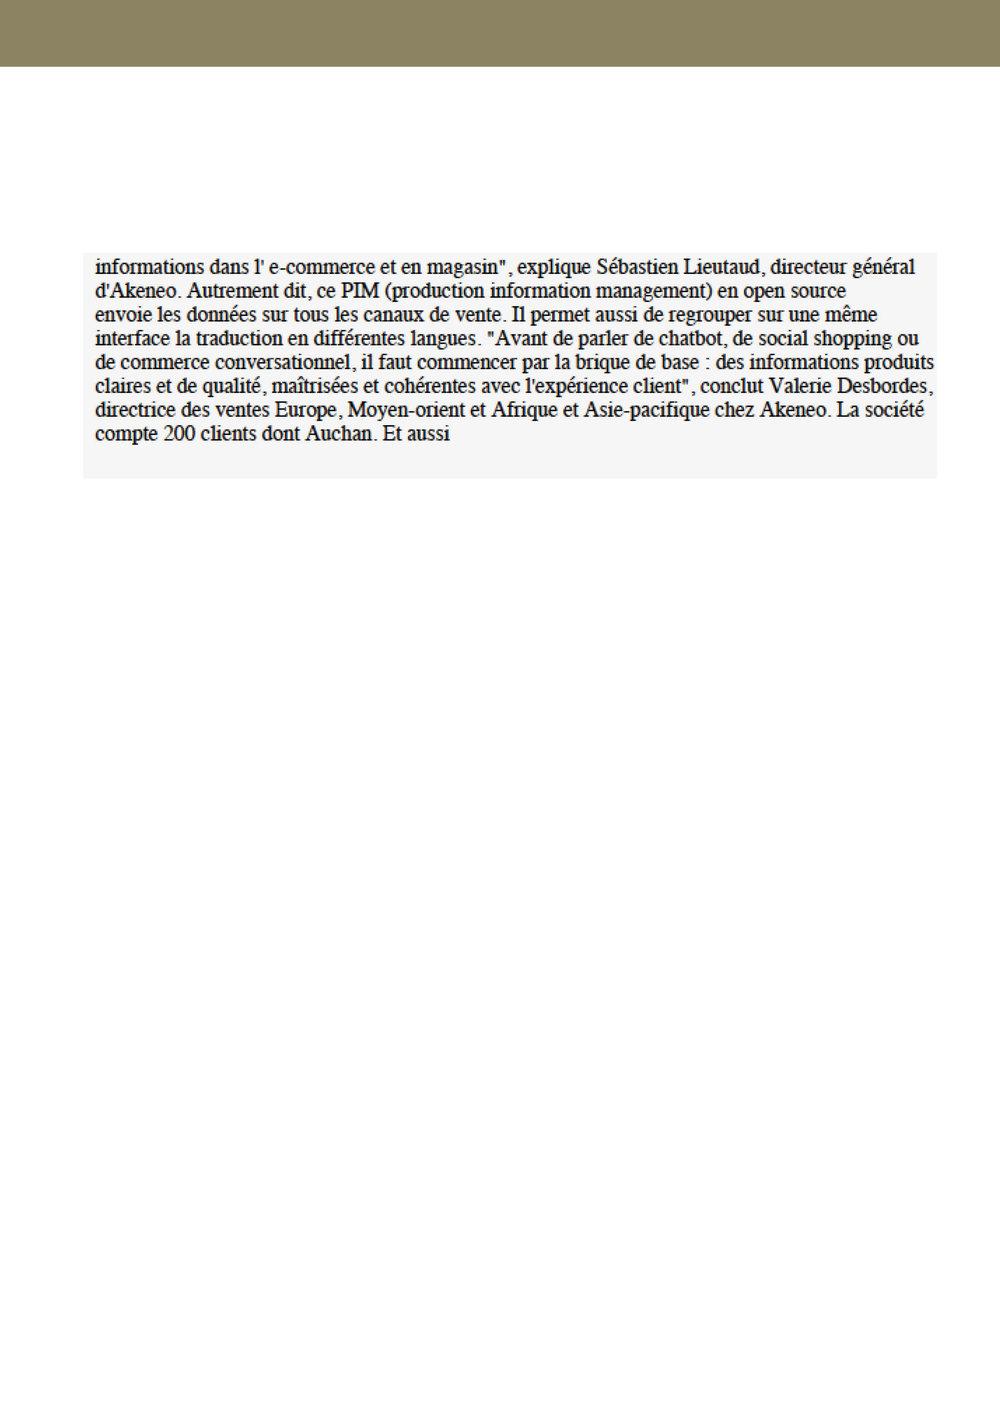 BOOKMEDIA_JANV_WEB43.jpg